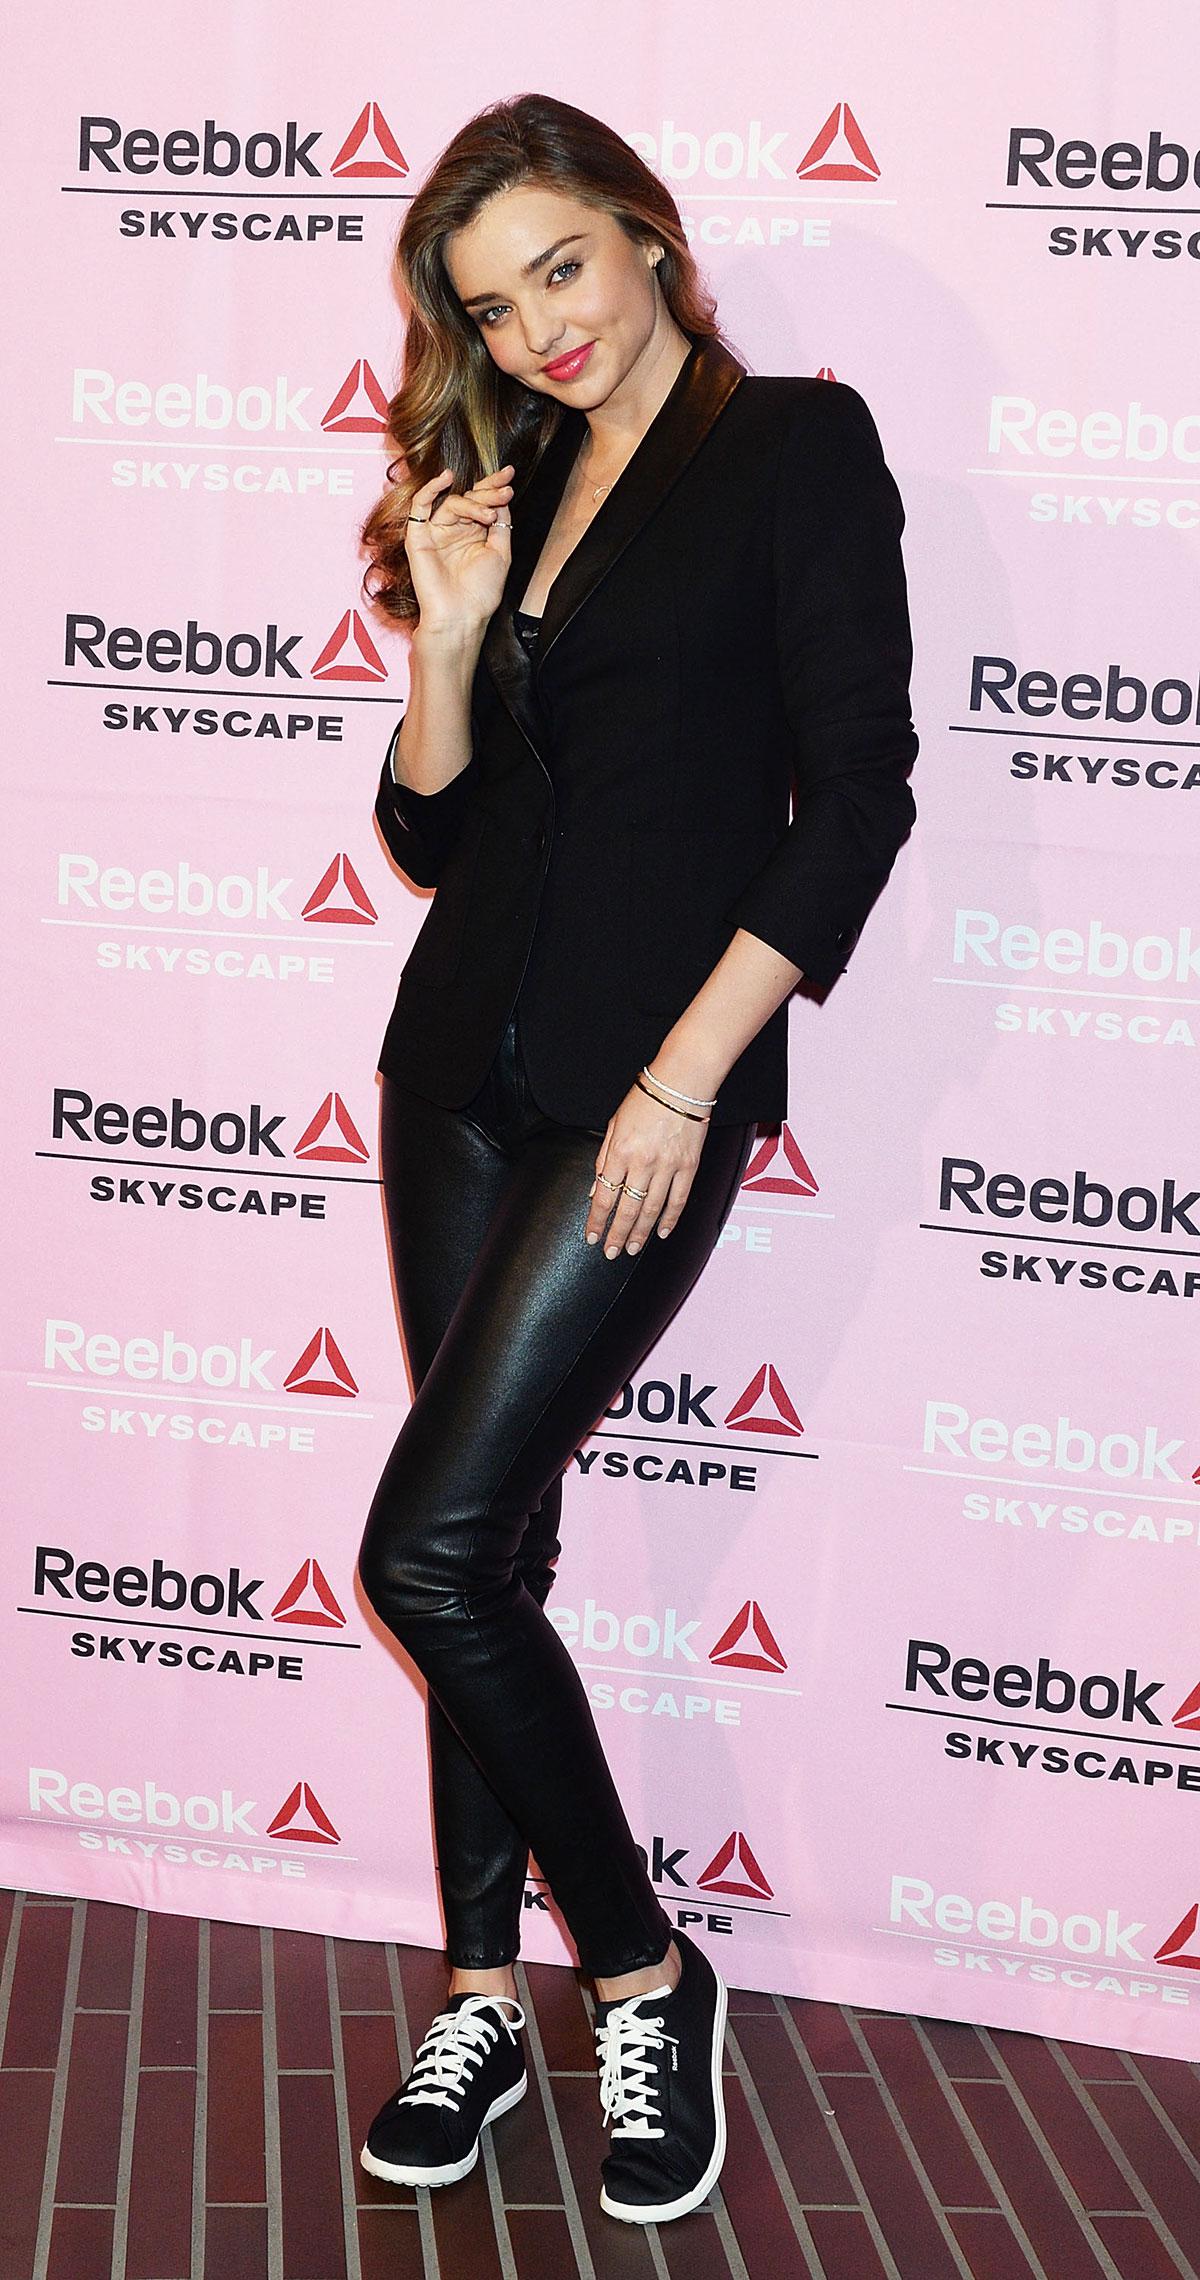 Miranda Kerr attends the Reebok Skyscape party photocall